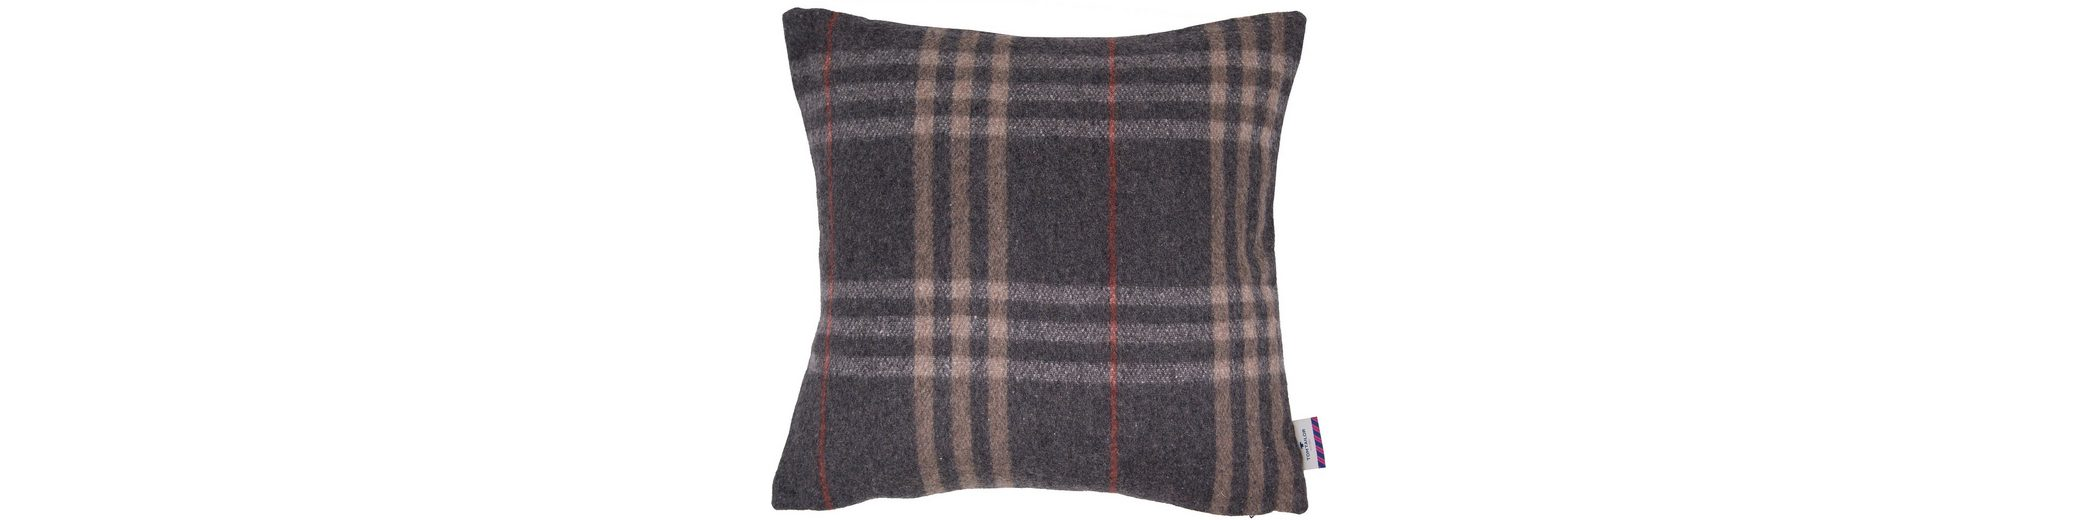 Kissenhülle, Tom Tailor, »Wool Check« (1 Stück)